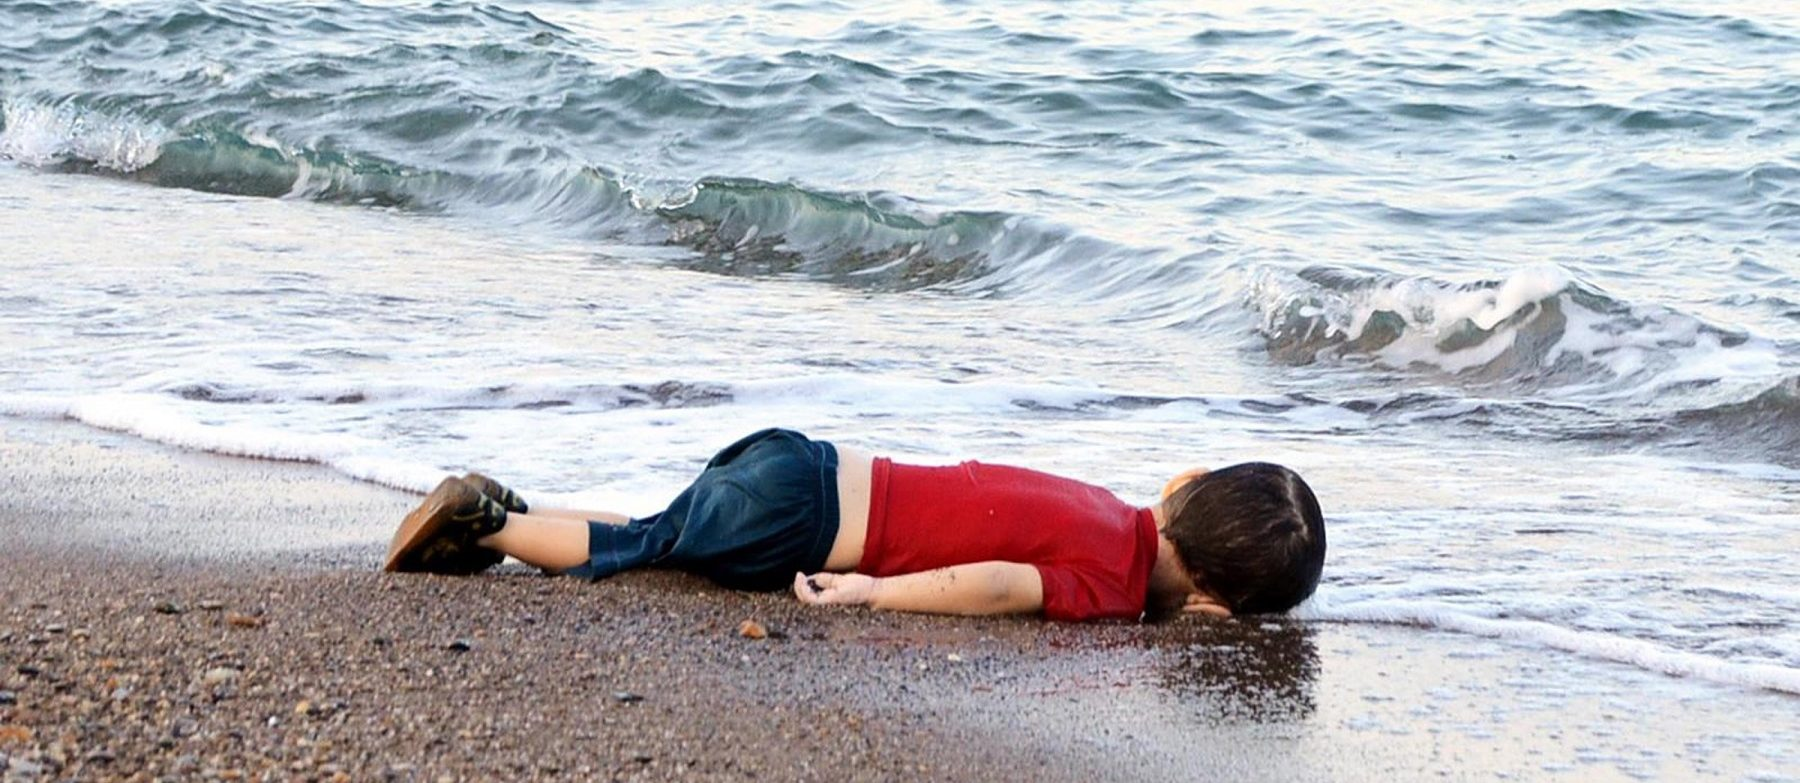 Alan Kurdi Getty Images/Nilufer Demir